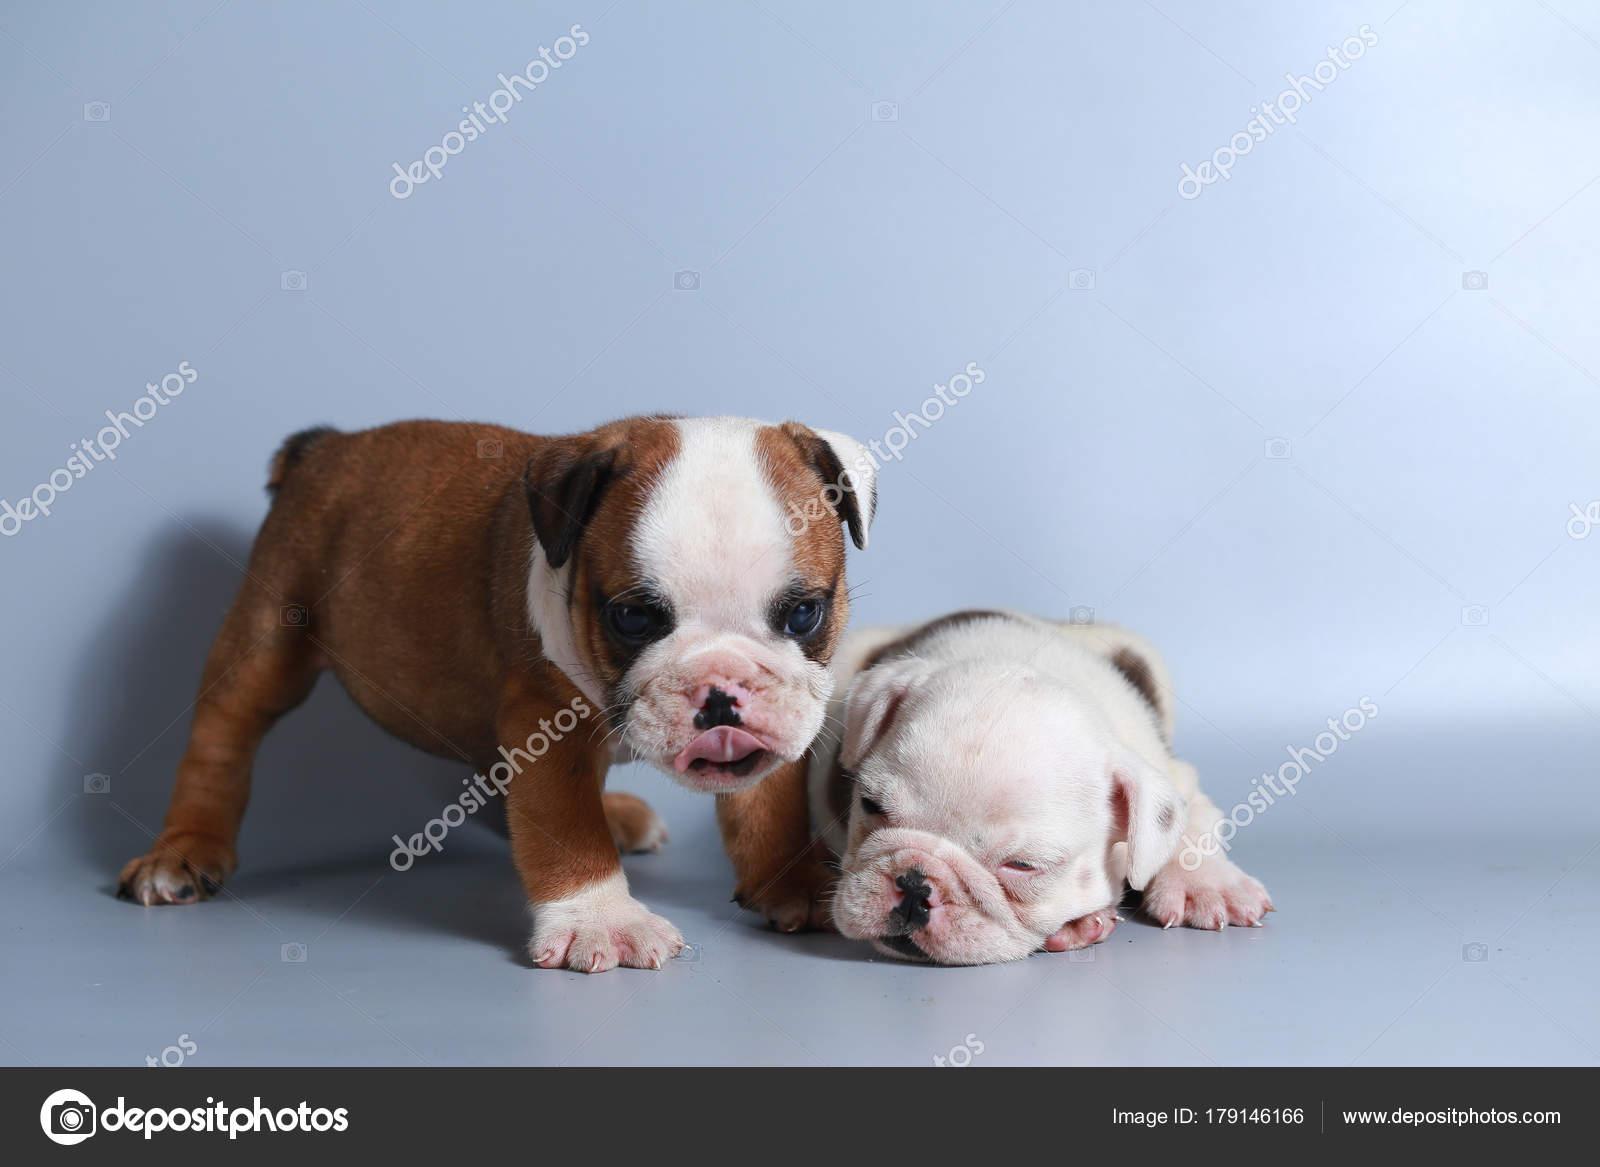 Month Purebred English Bulldog Puppy Gray Screen Stock Photo C S Thanawathreborn Gmail Com 179146166